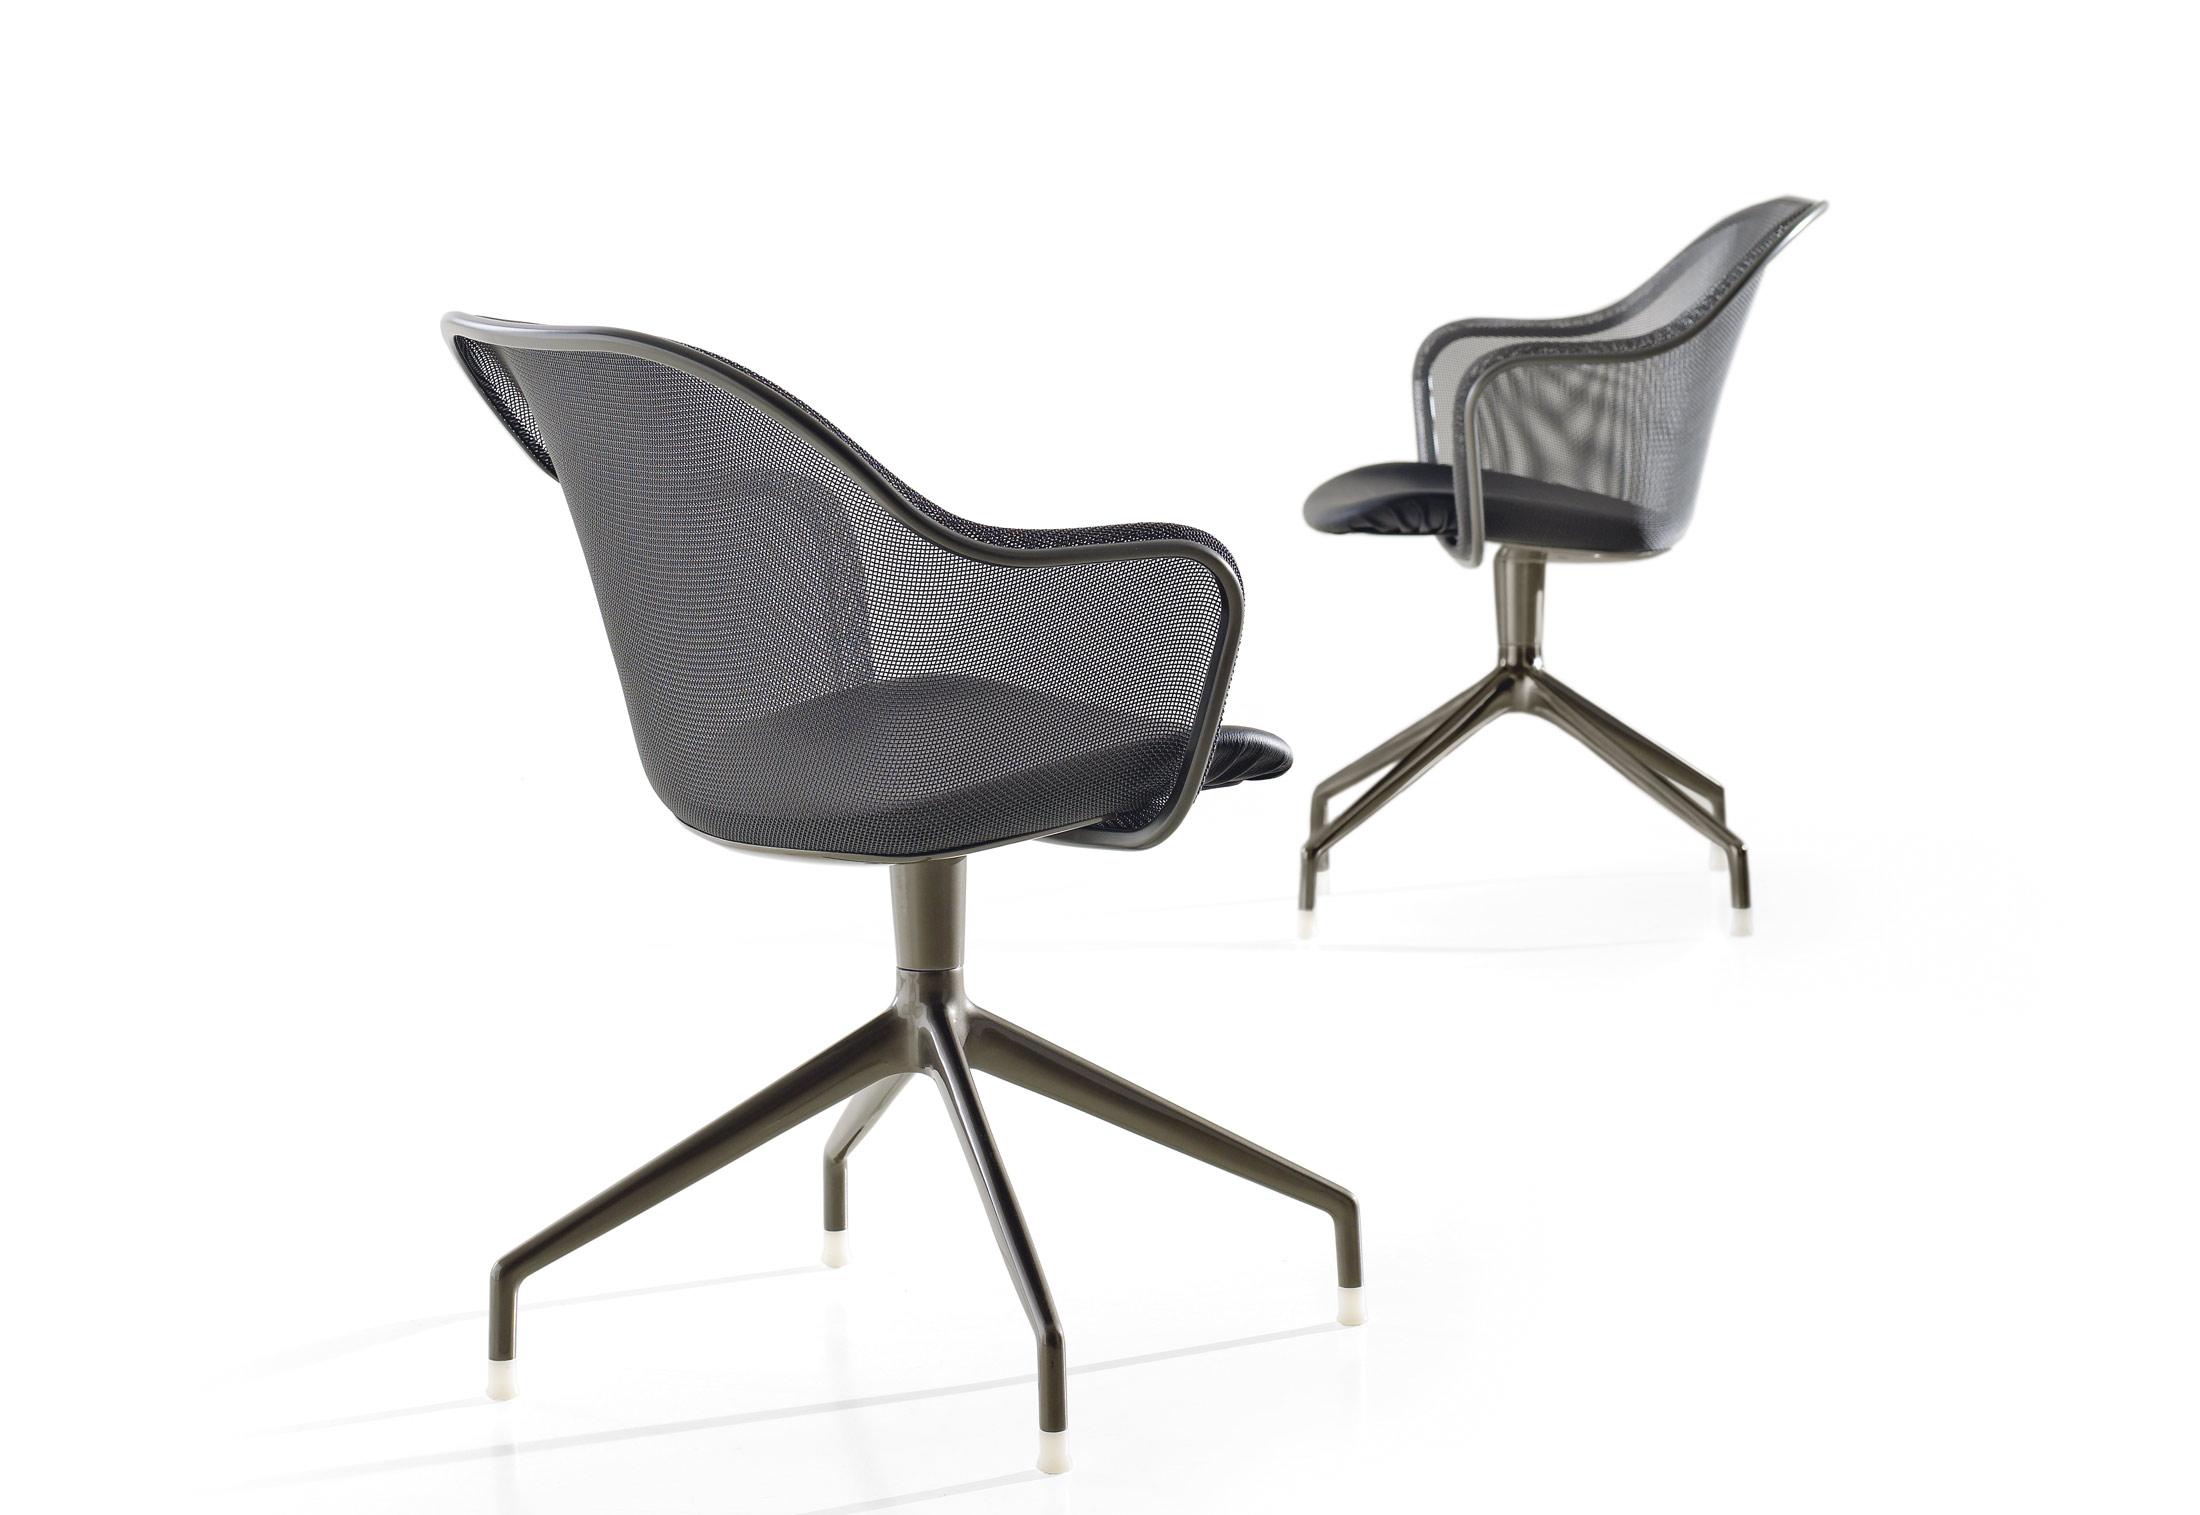 iuta stuhl mit armlehnen von b b italia stylepark. Black Bedroom Furniture Sets. Home Design Ideas